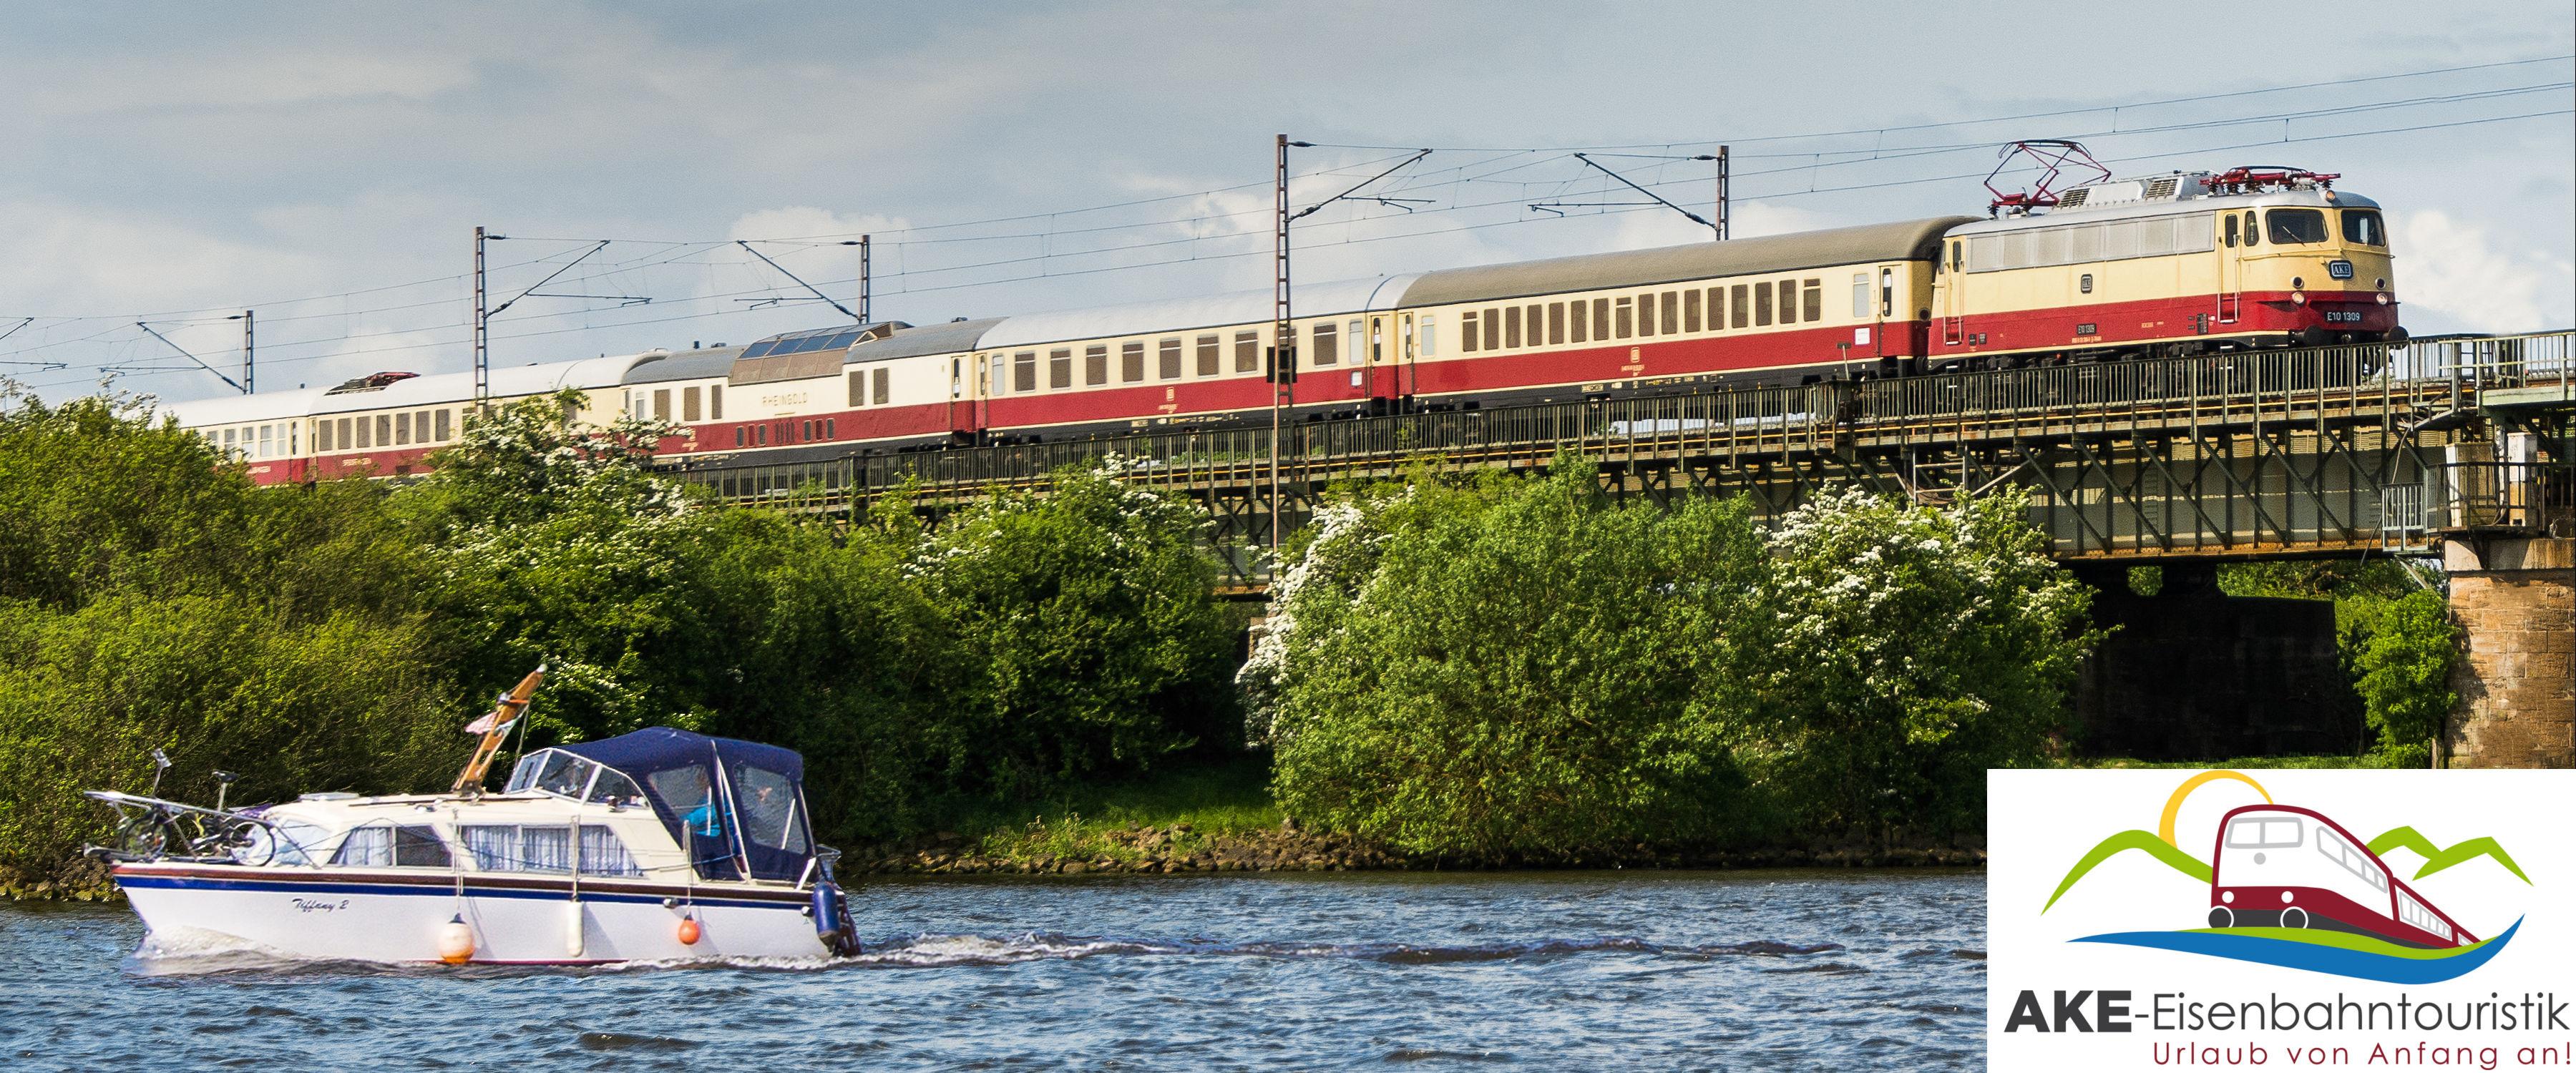 AKE-Eisenbahntouristik - Urlaub von Anfang an